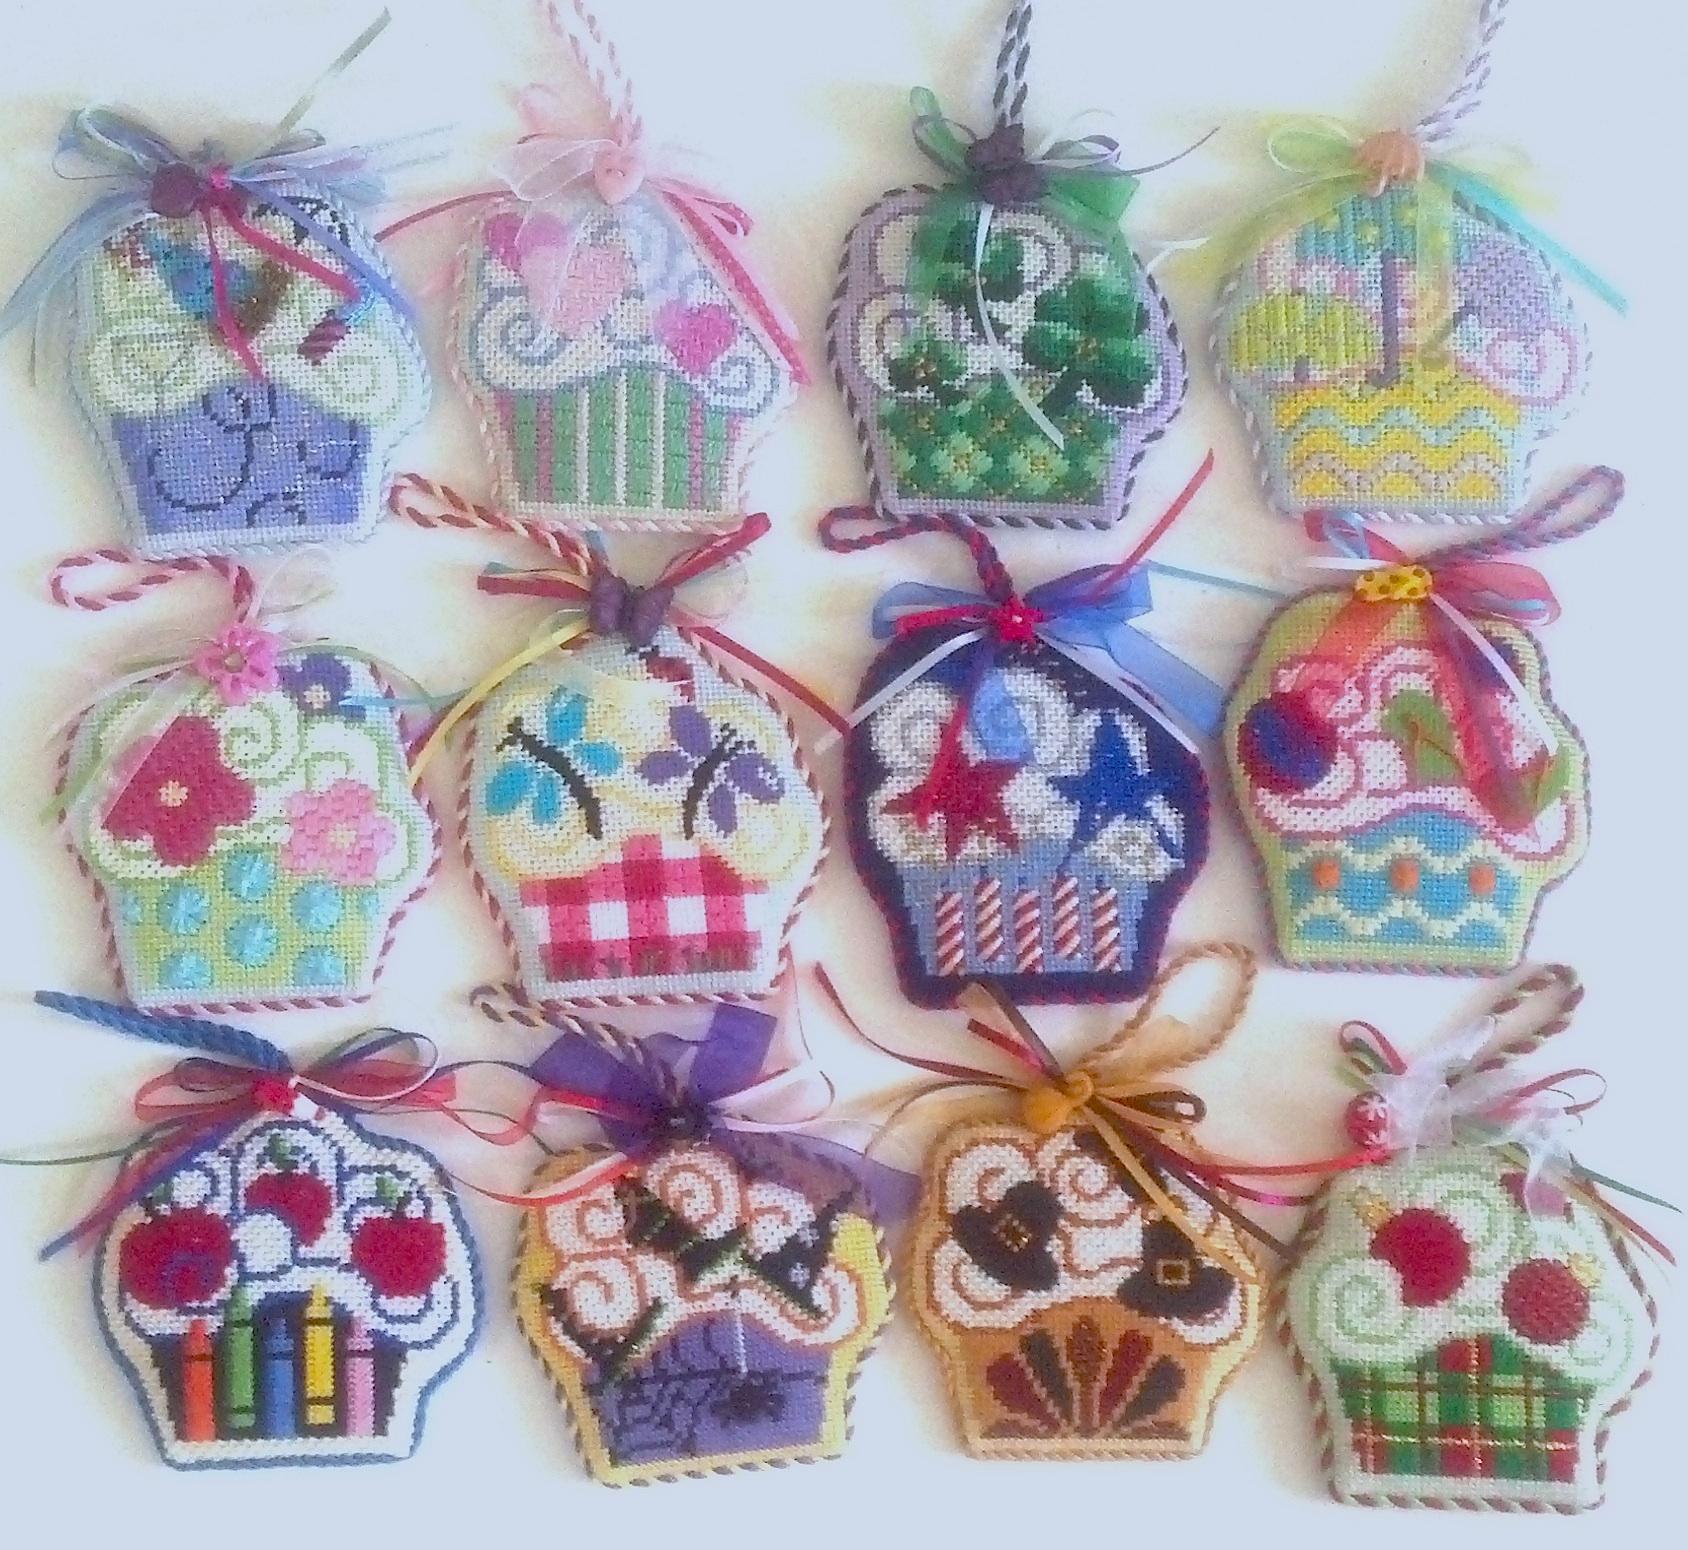 Needlepoint Cupcakes